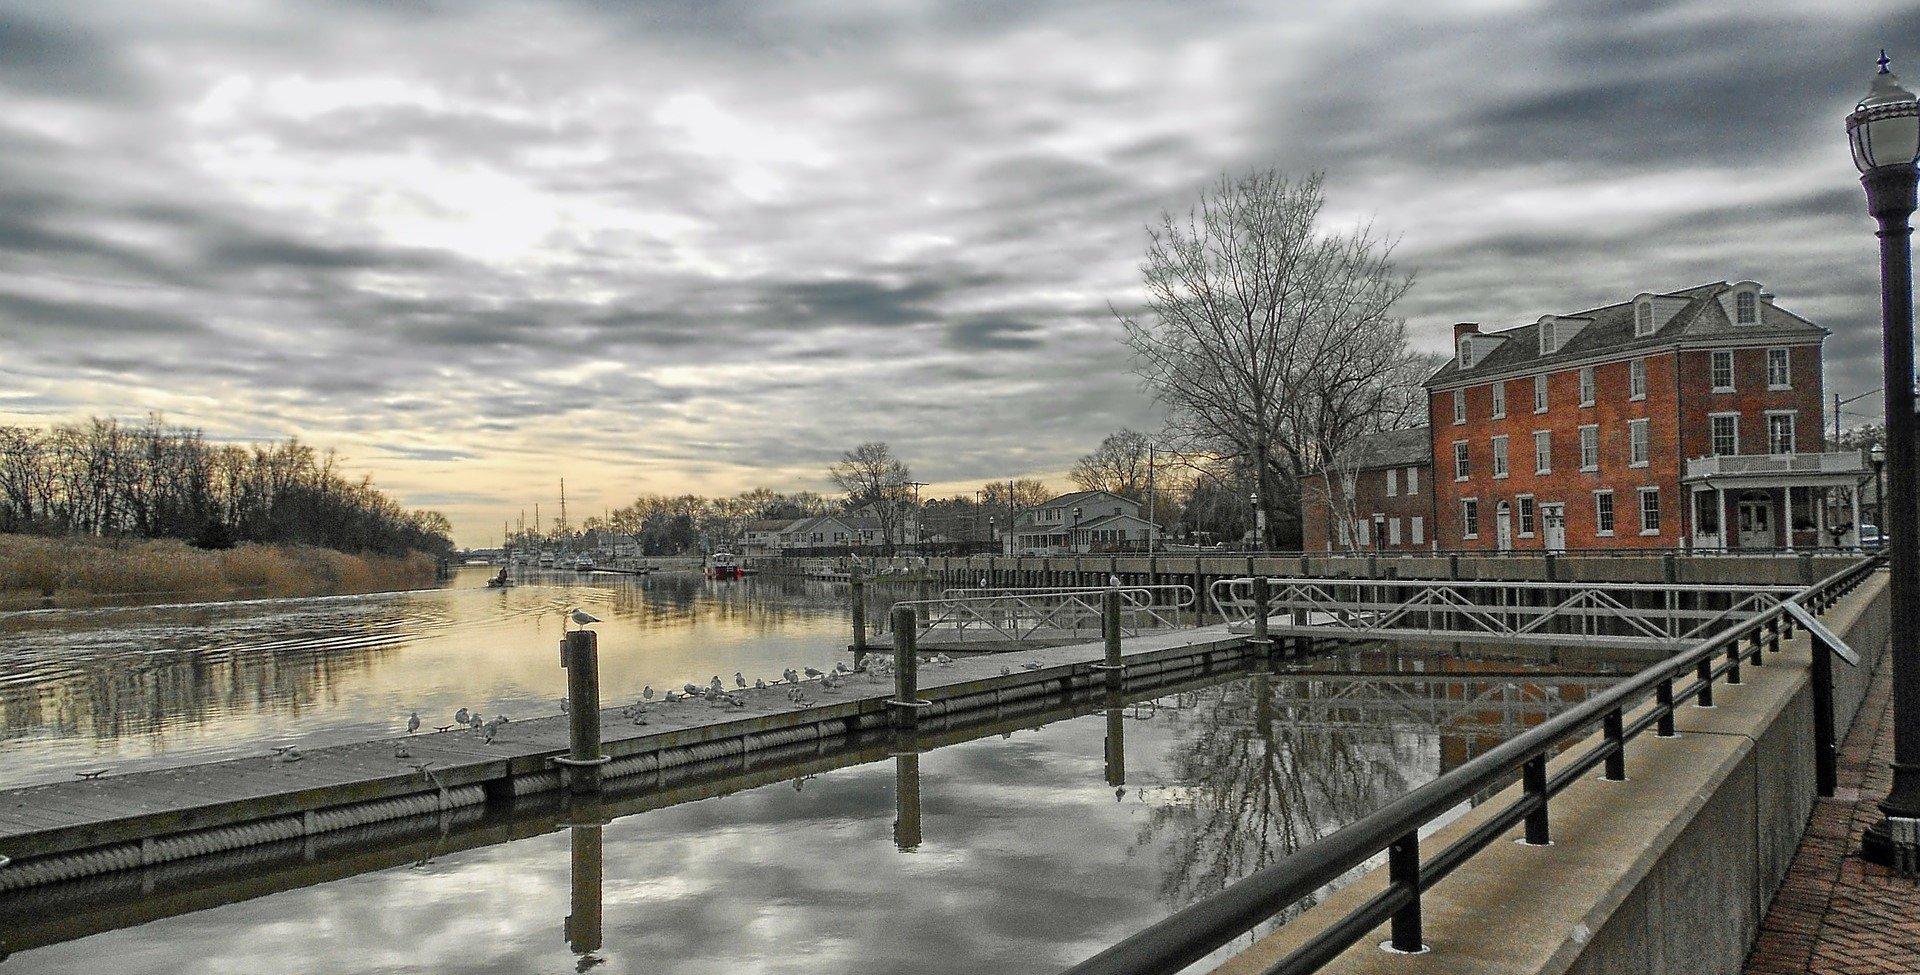 Canal in Delaware - VeteranCarDonations.org